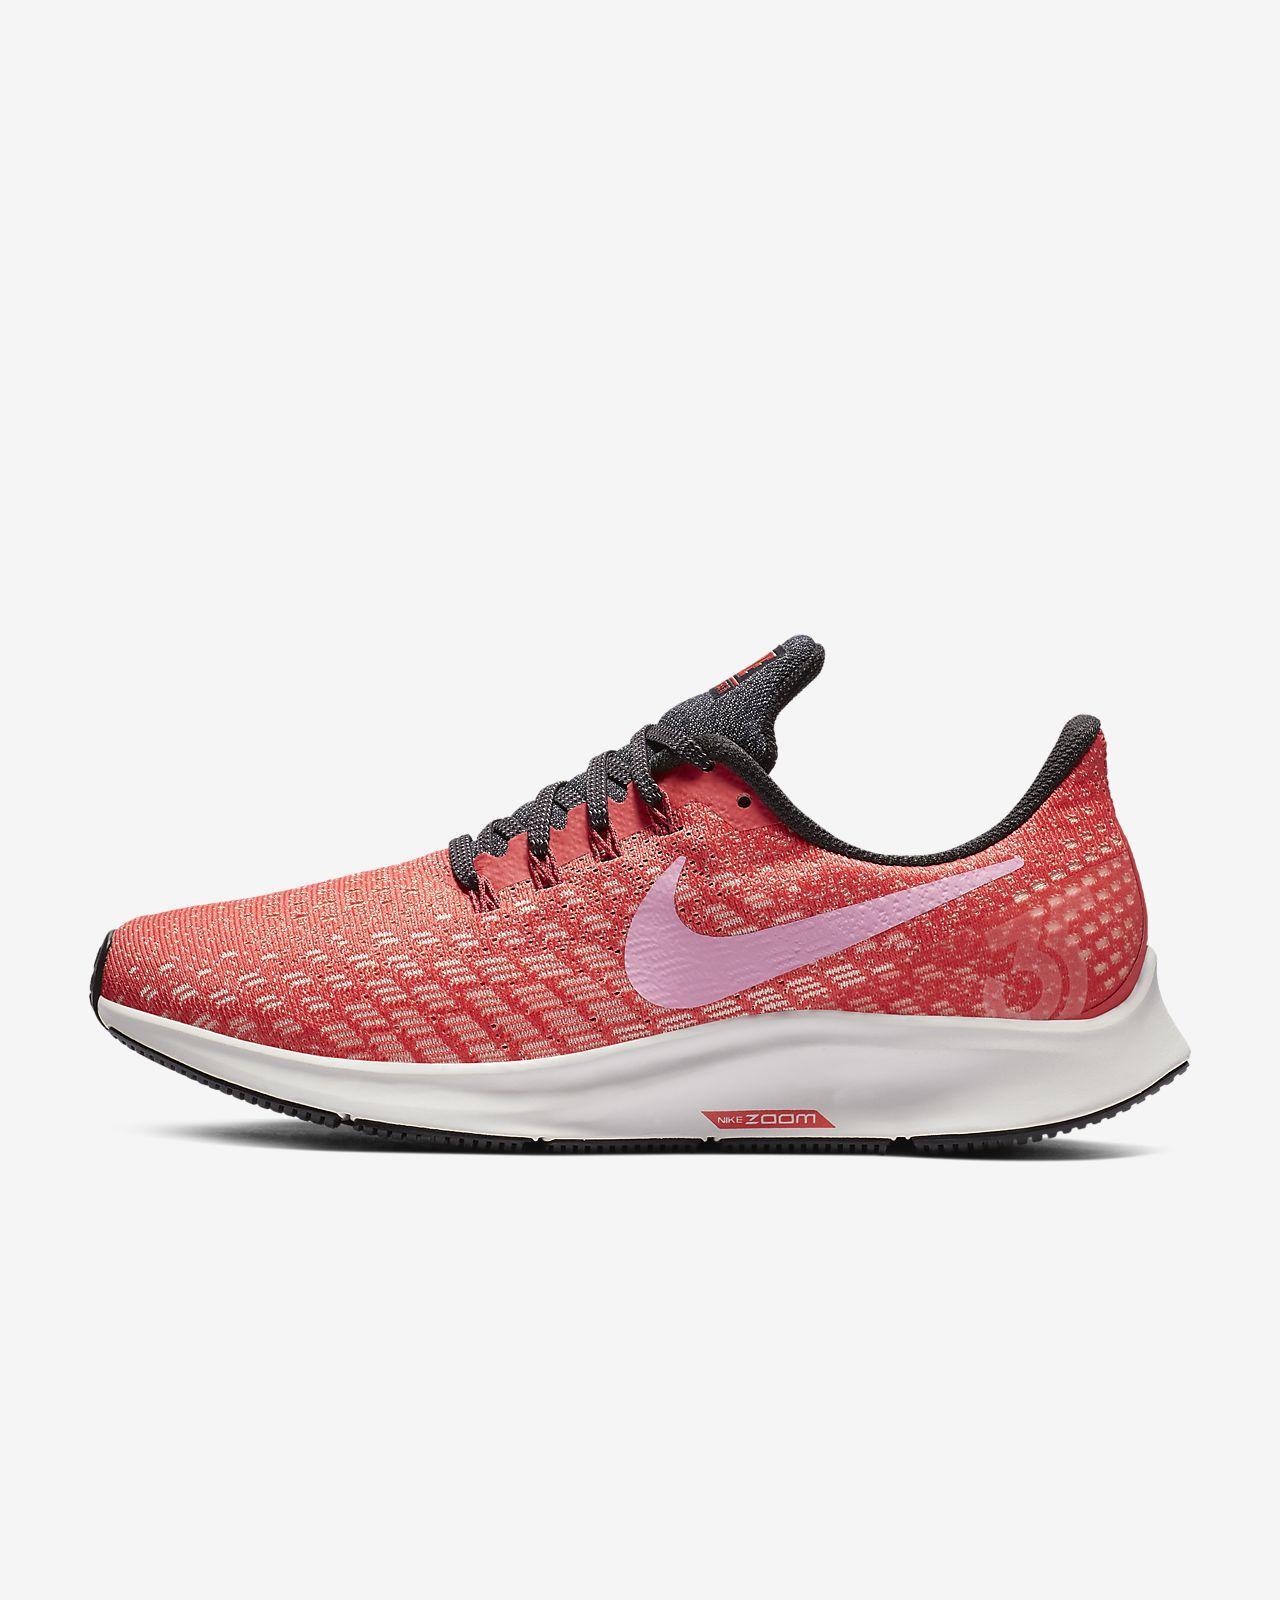 6410e4f498fc Nike Air Zoom Pegasus 35 Women s Running Shoe. Nike.com